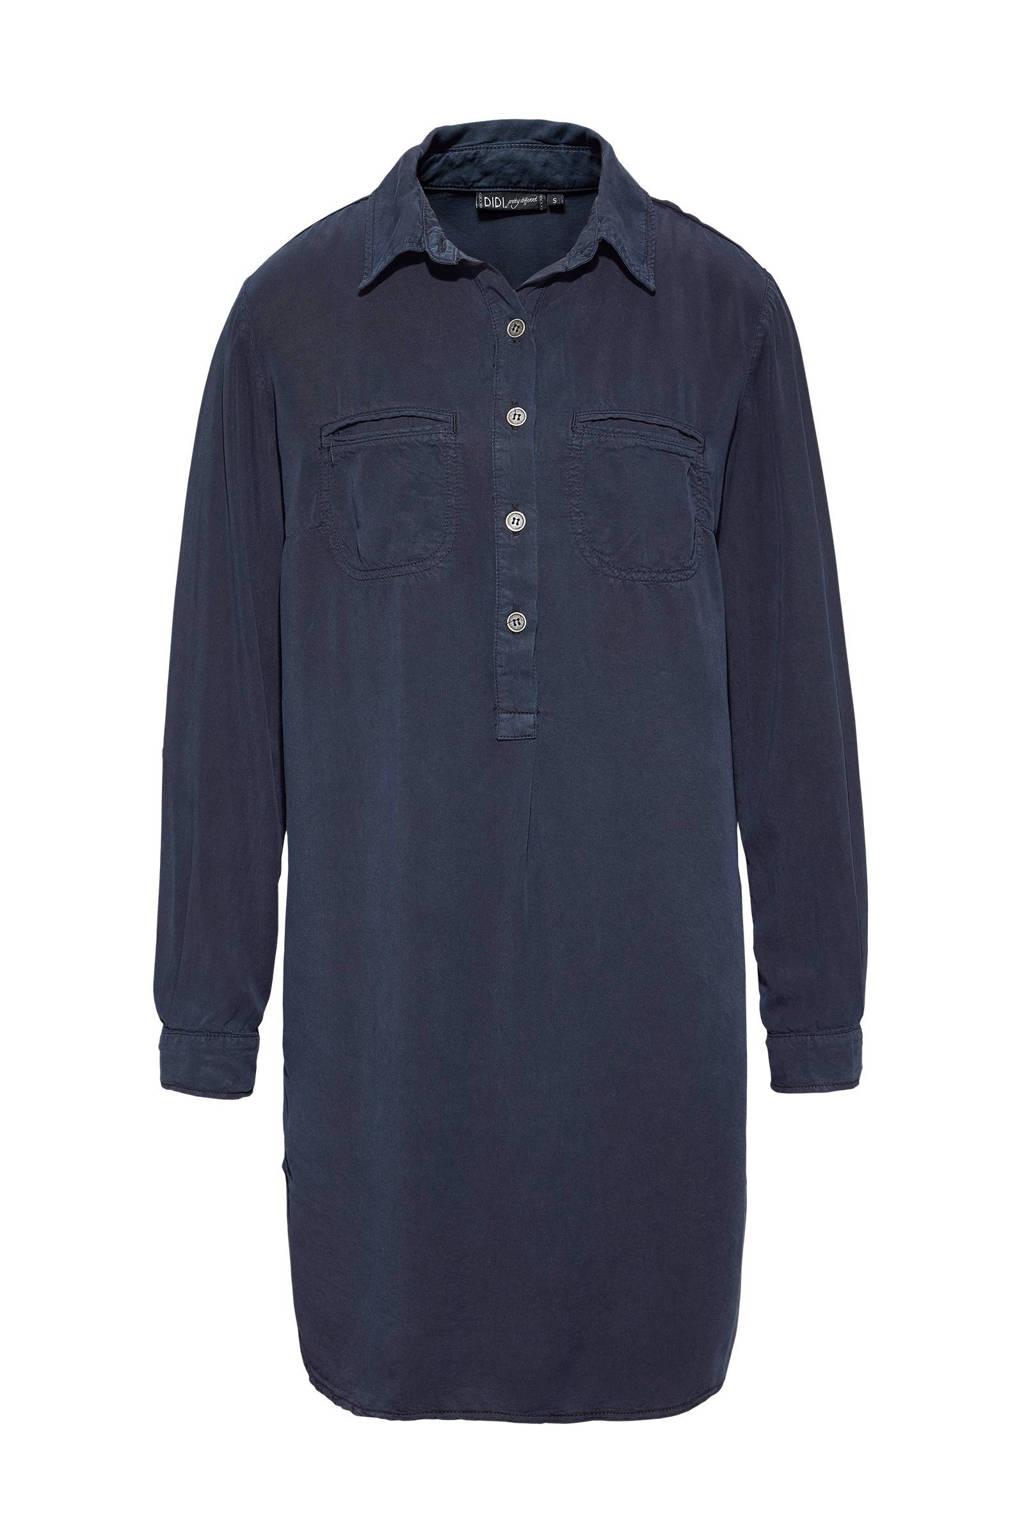 Didi blousejurk, Donkerblauw